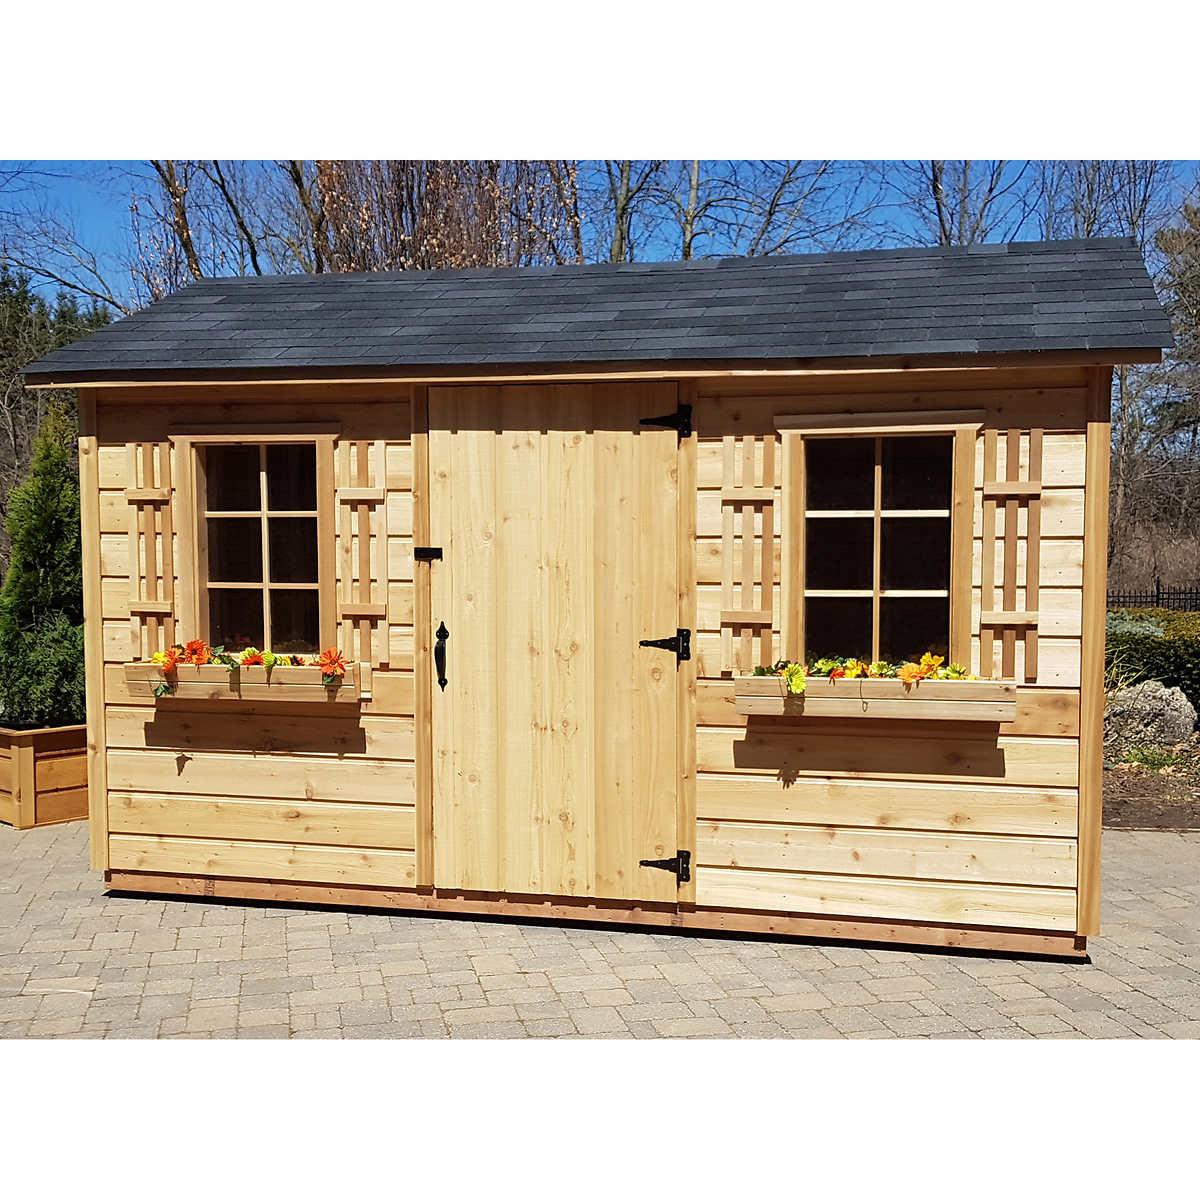 Garden Sheds Canada hampton 2.4 m x 3.7 m (8 ft. x 12 ft.) storage shed